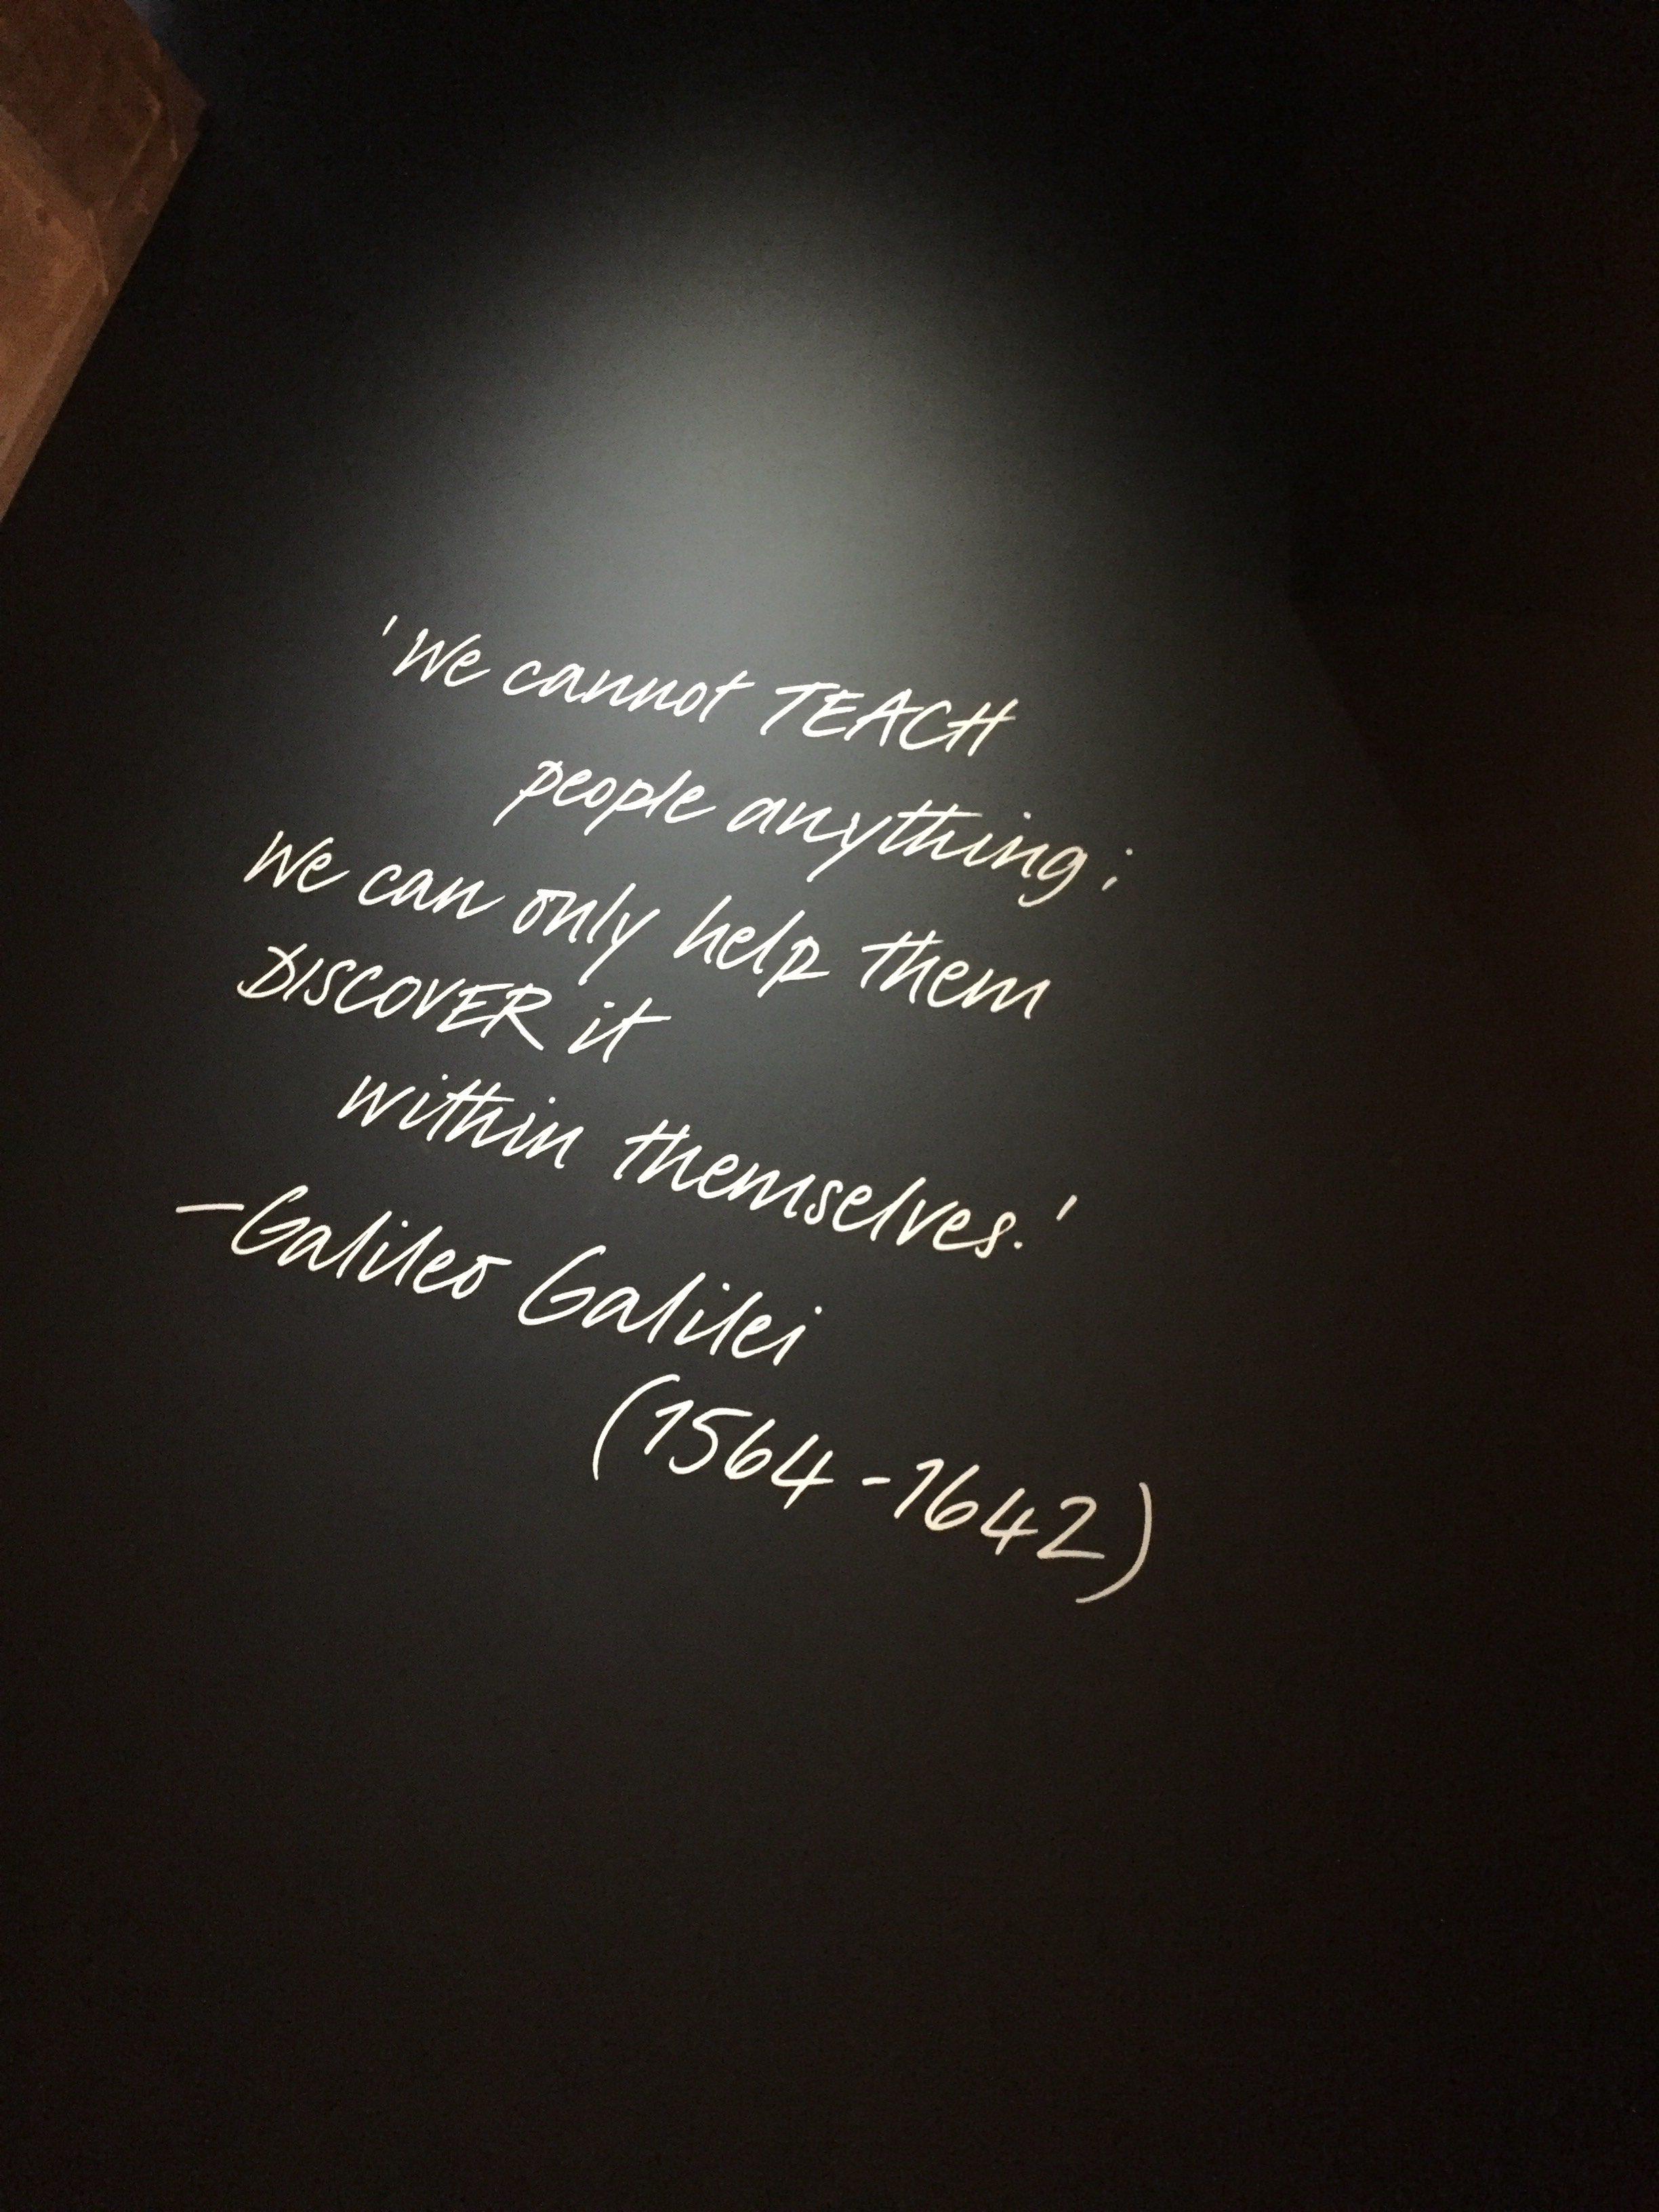 Galileo quote on Opera, Passion, Power and Politics